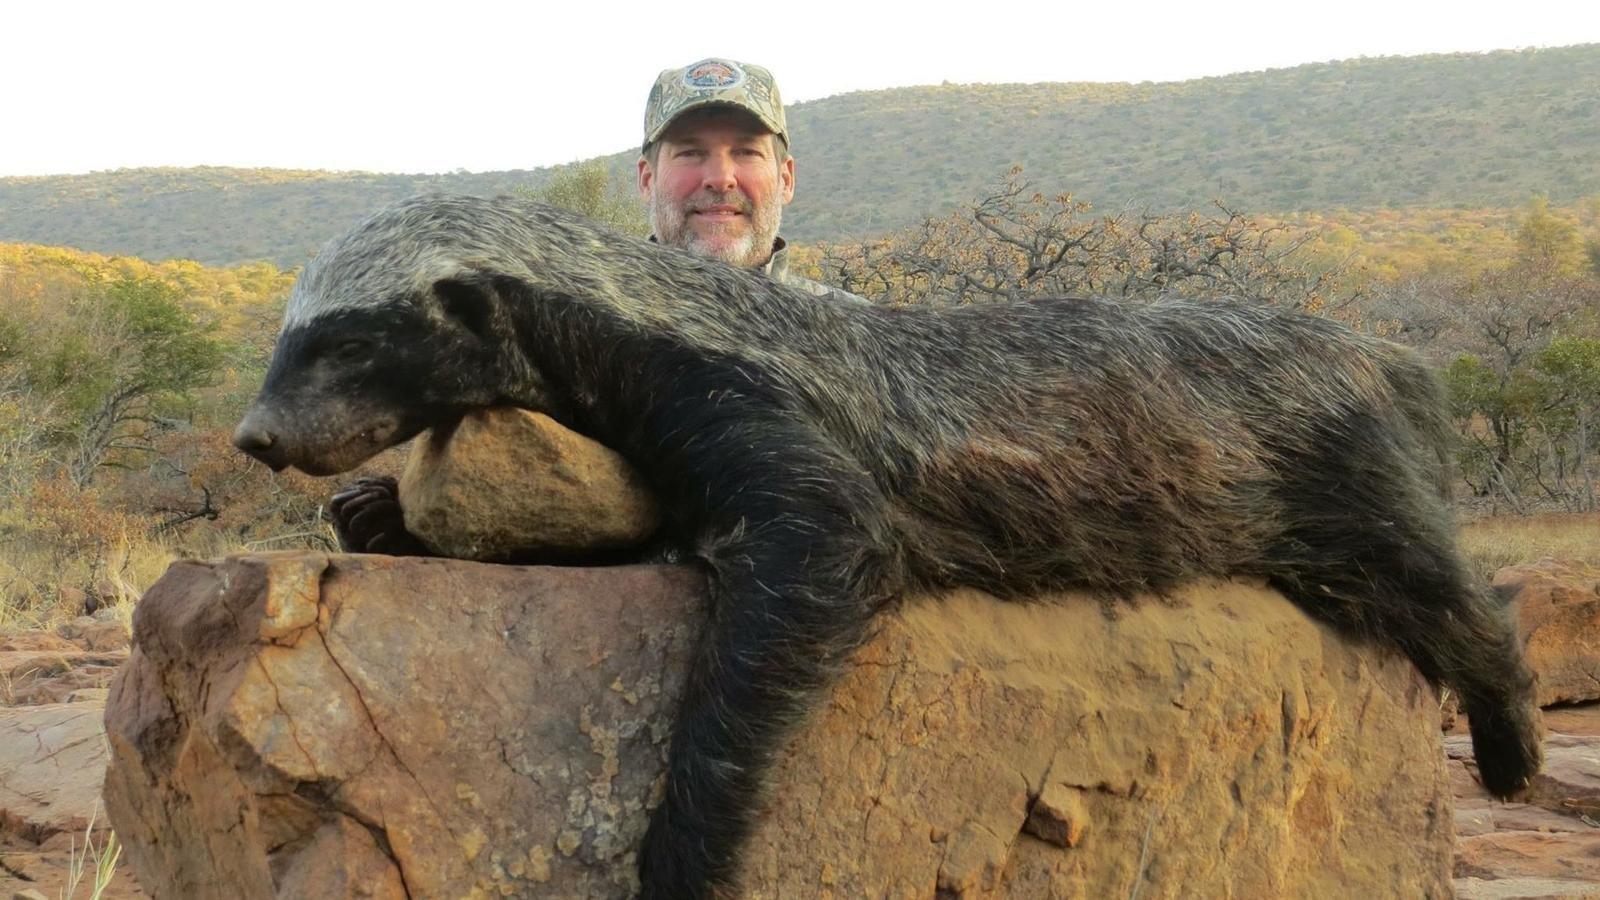 Hunter kills bear with spear, and Under Armour kills